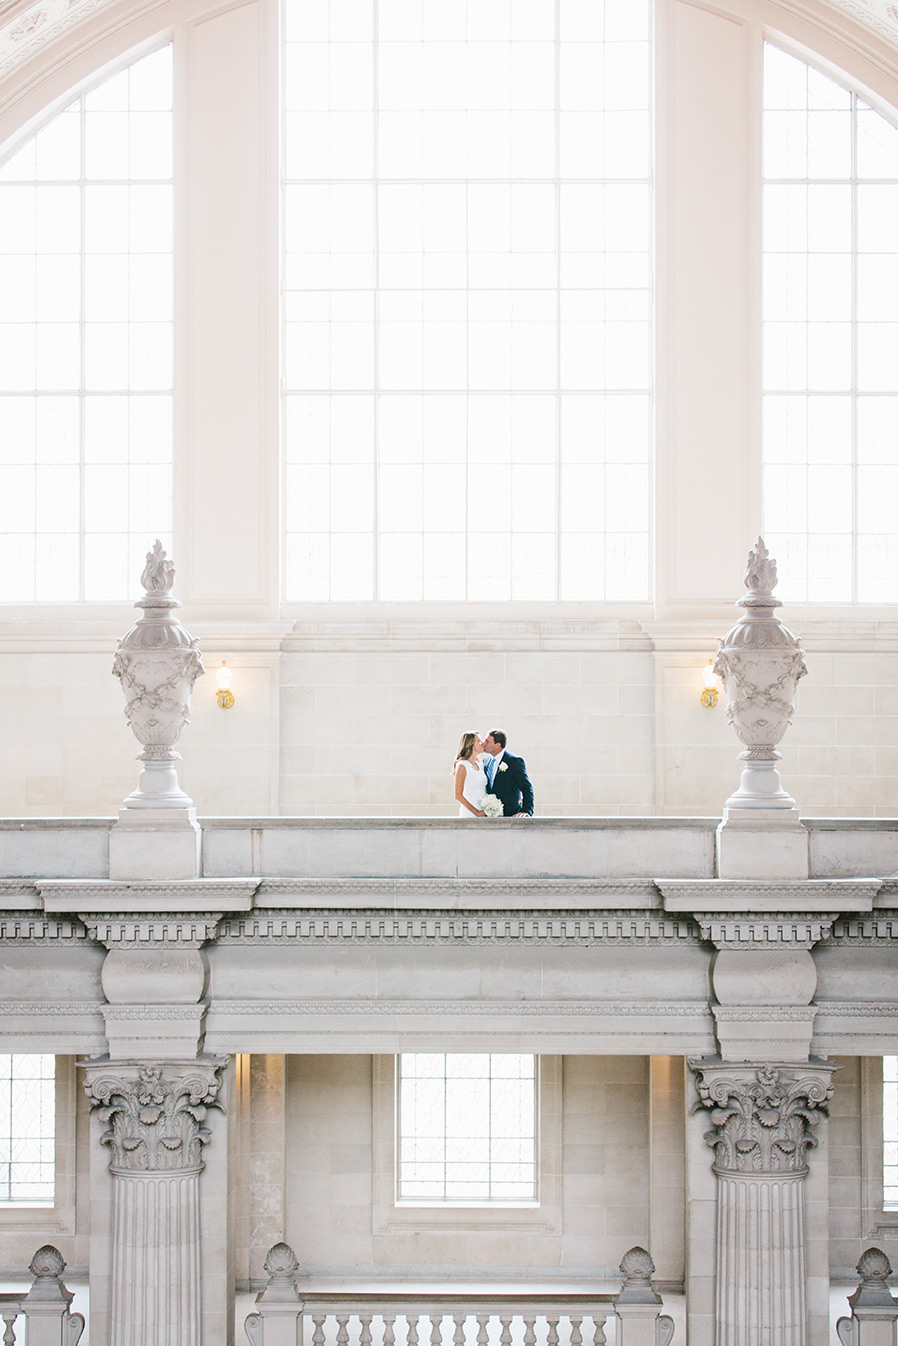 FourthFloor_SanFrancisco_CityHall_Bride_Groom_kiss.jpg